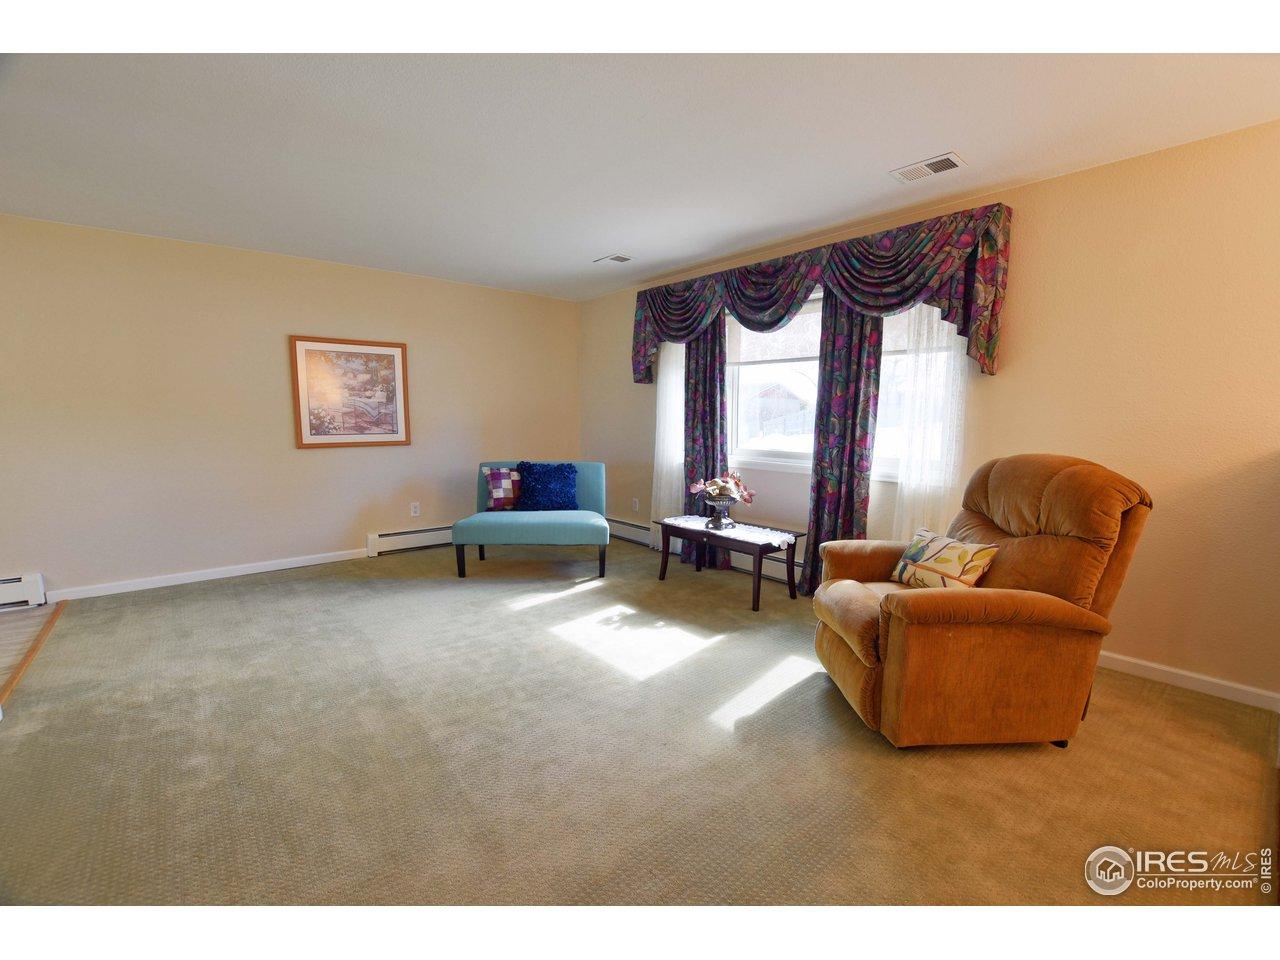 Spac living room